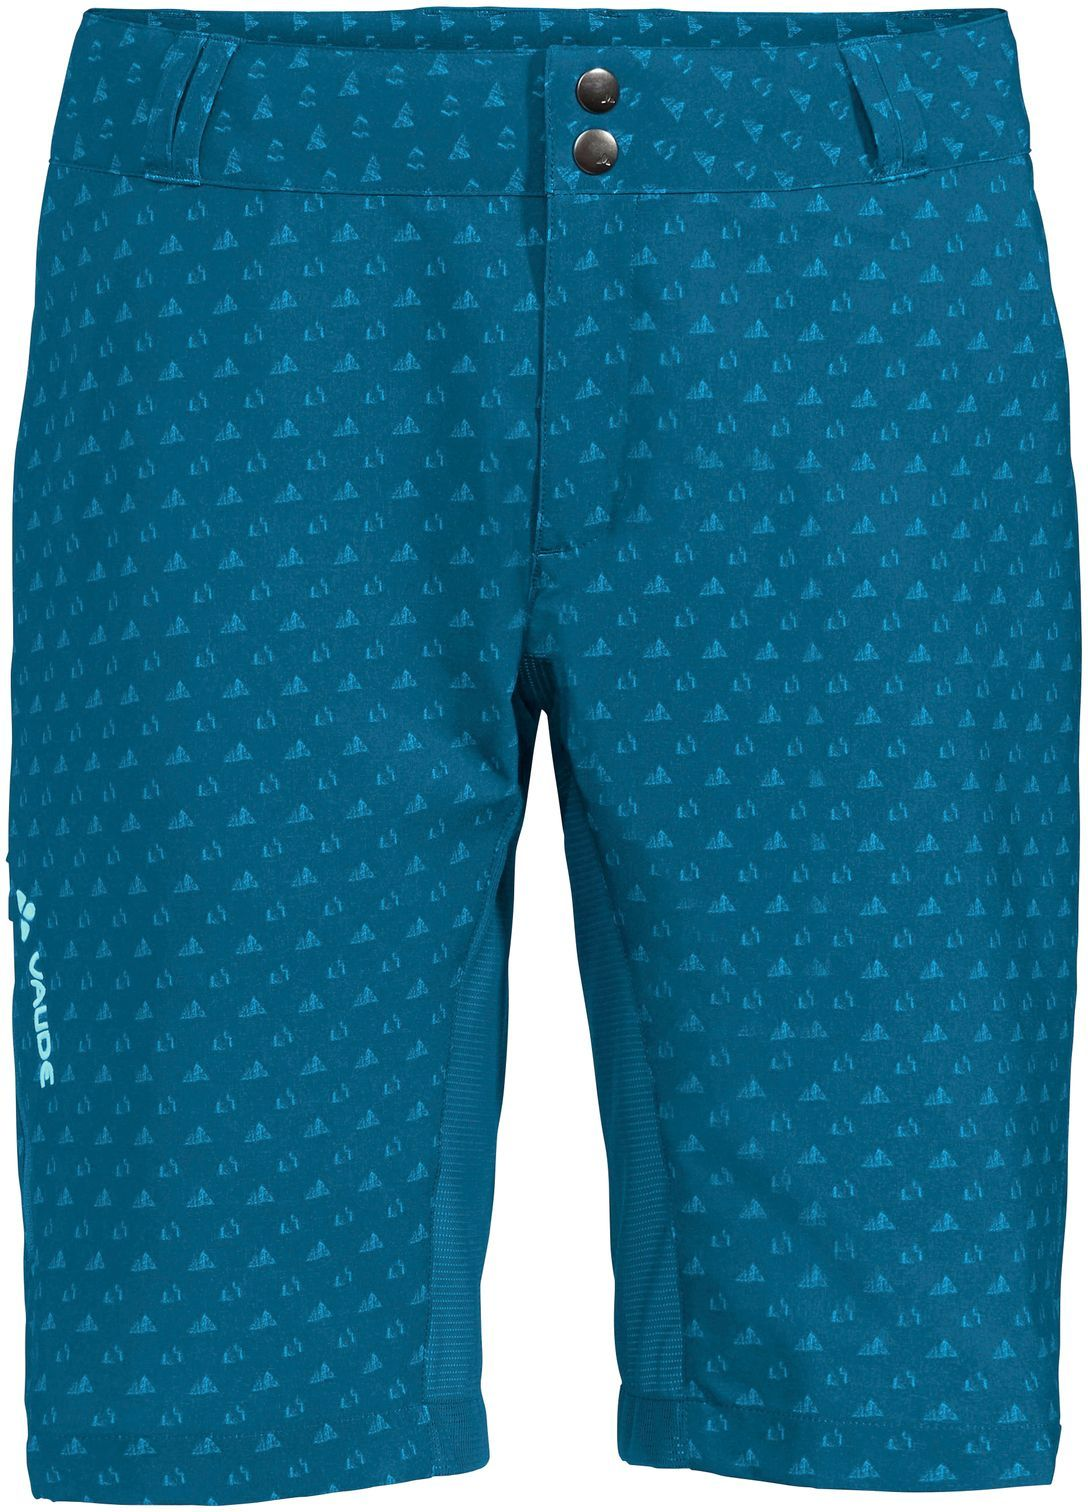 Vaude Women's Ligure Shorts - kingfisher uni XS